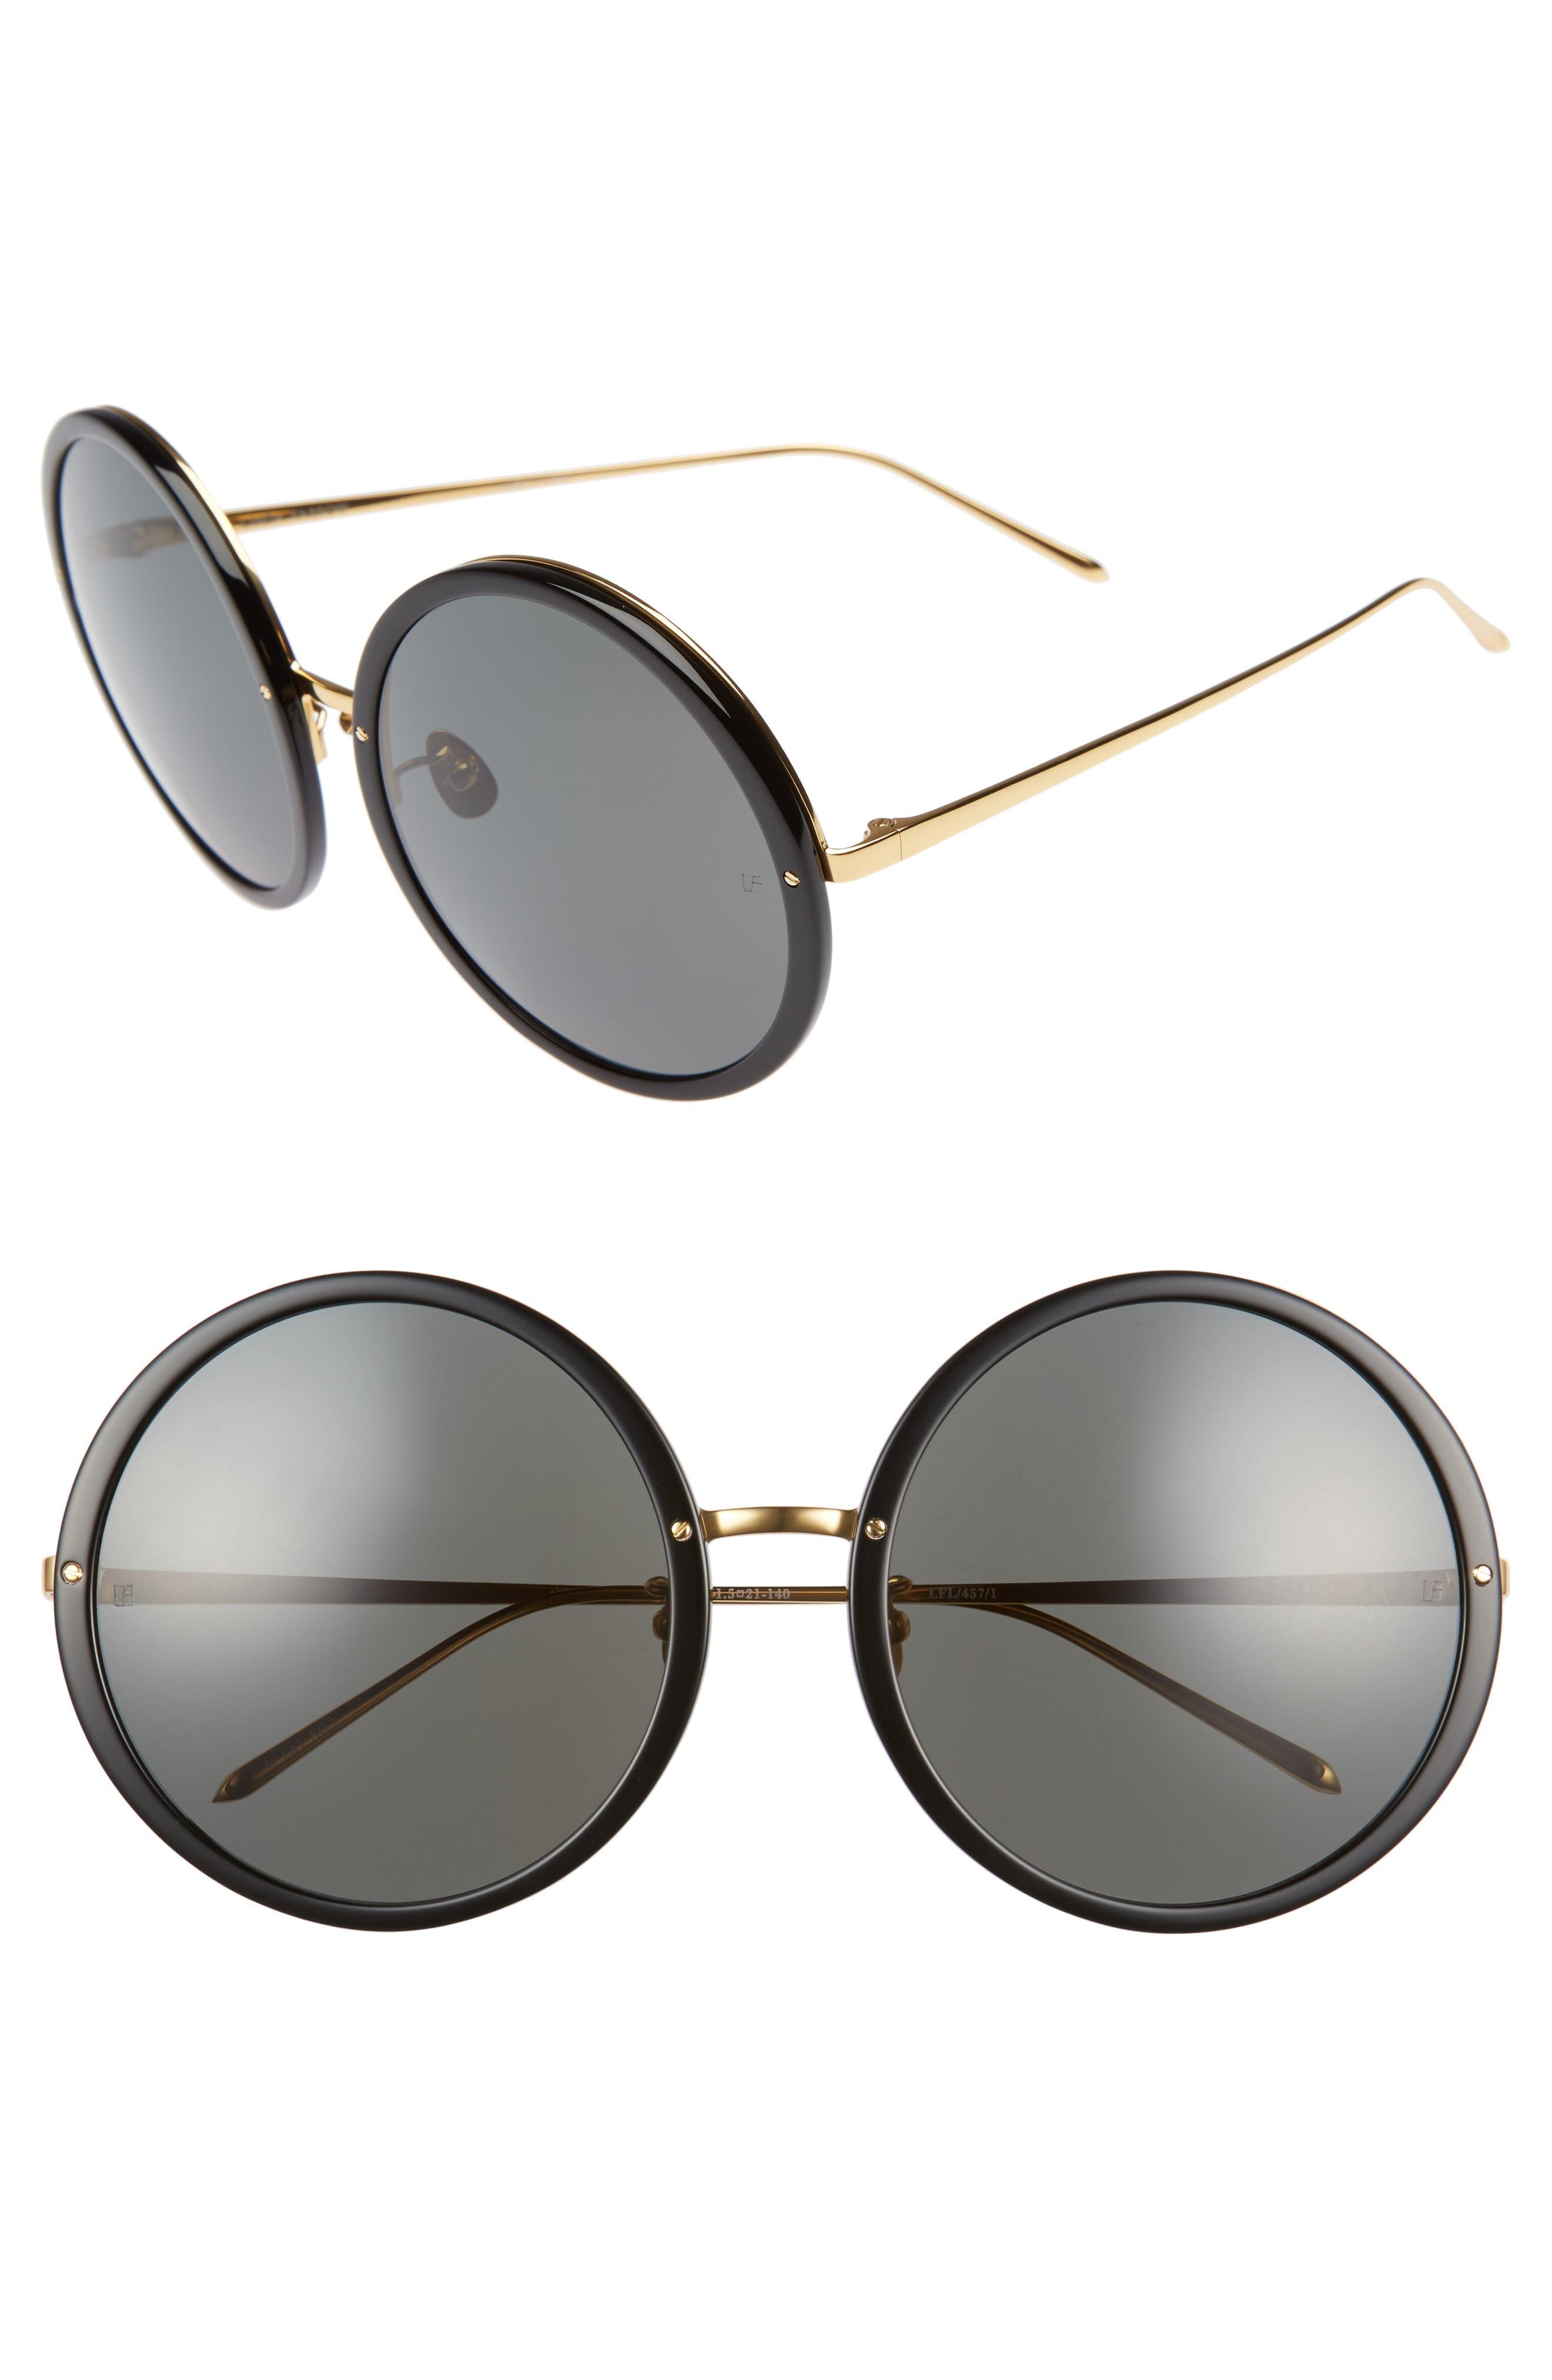 61mm Round 18 Karat Gold Trim Sunglasses,                         Main,                         color, BLACK/ YELLOW GOLD/ GREY